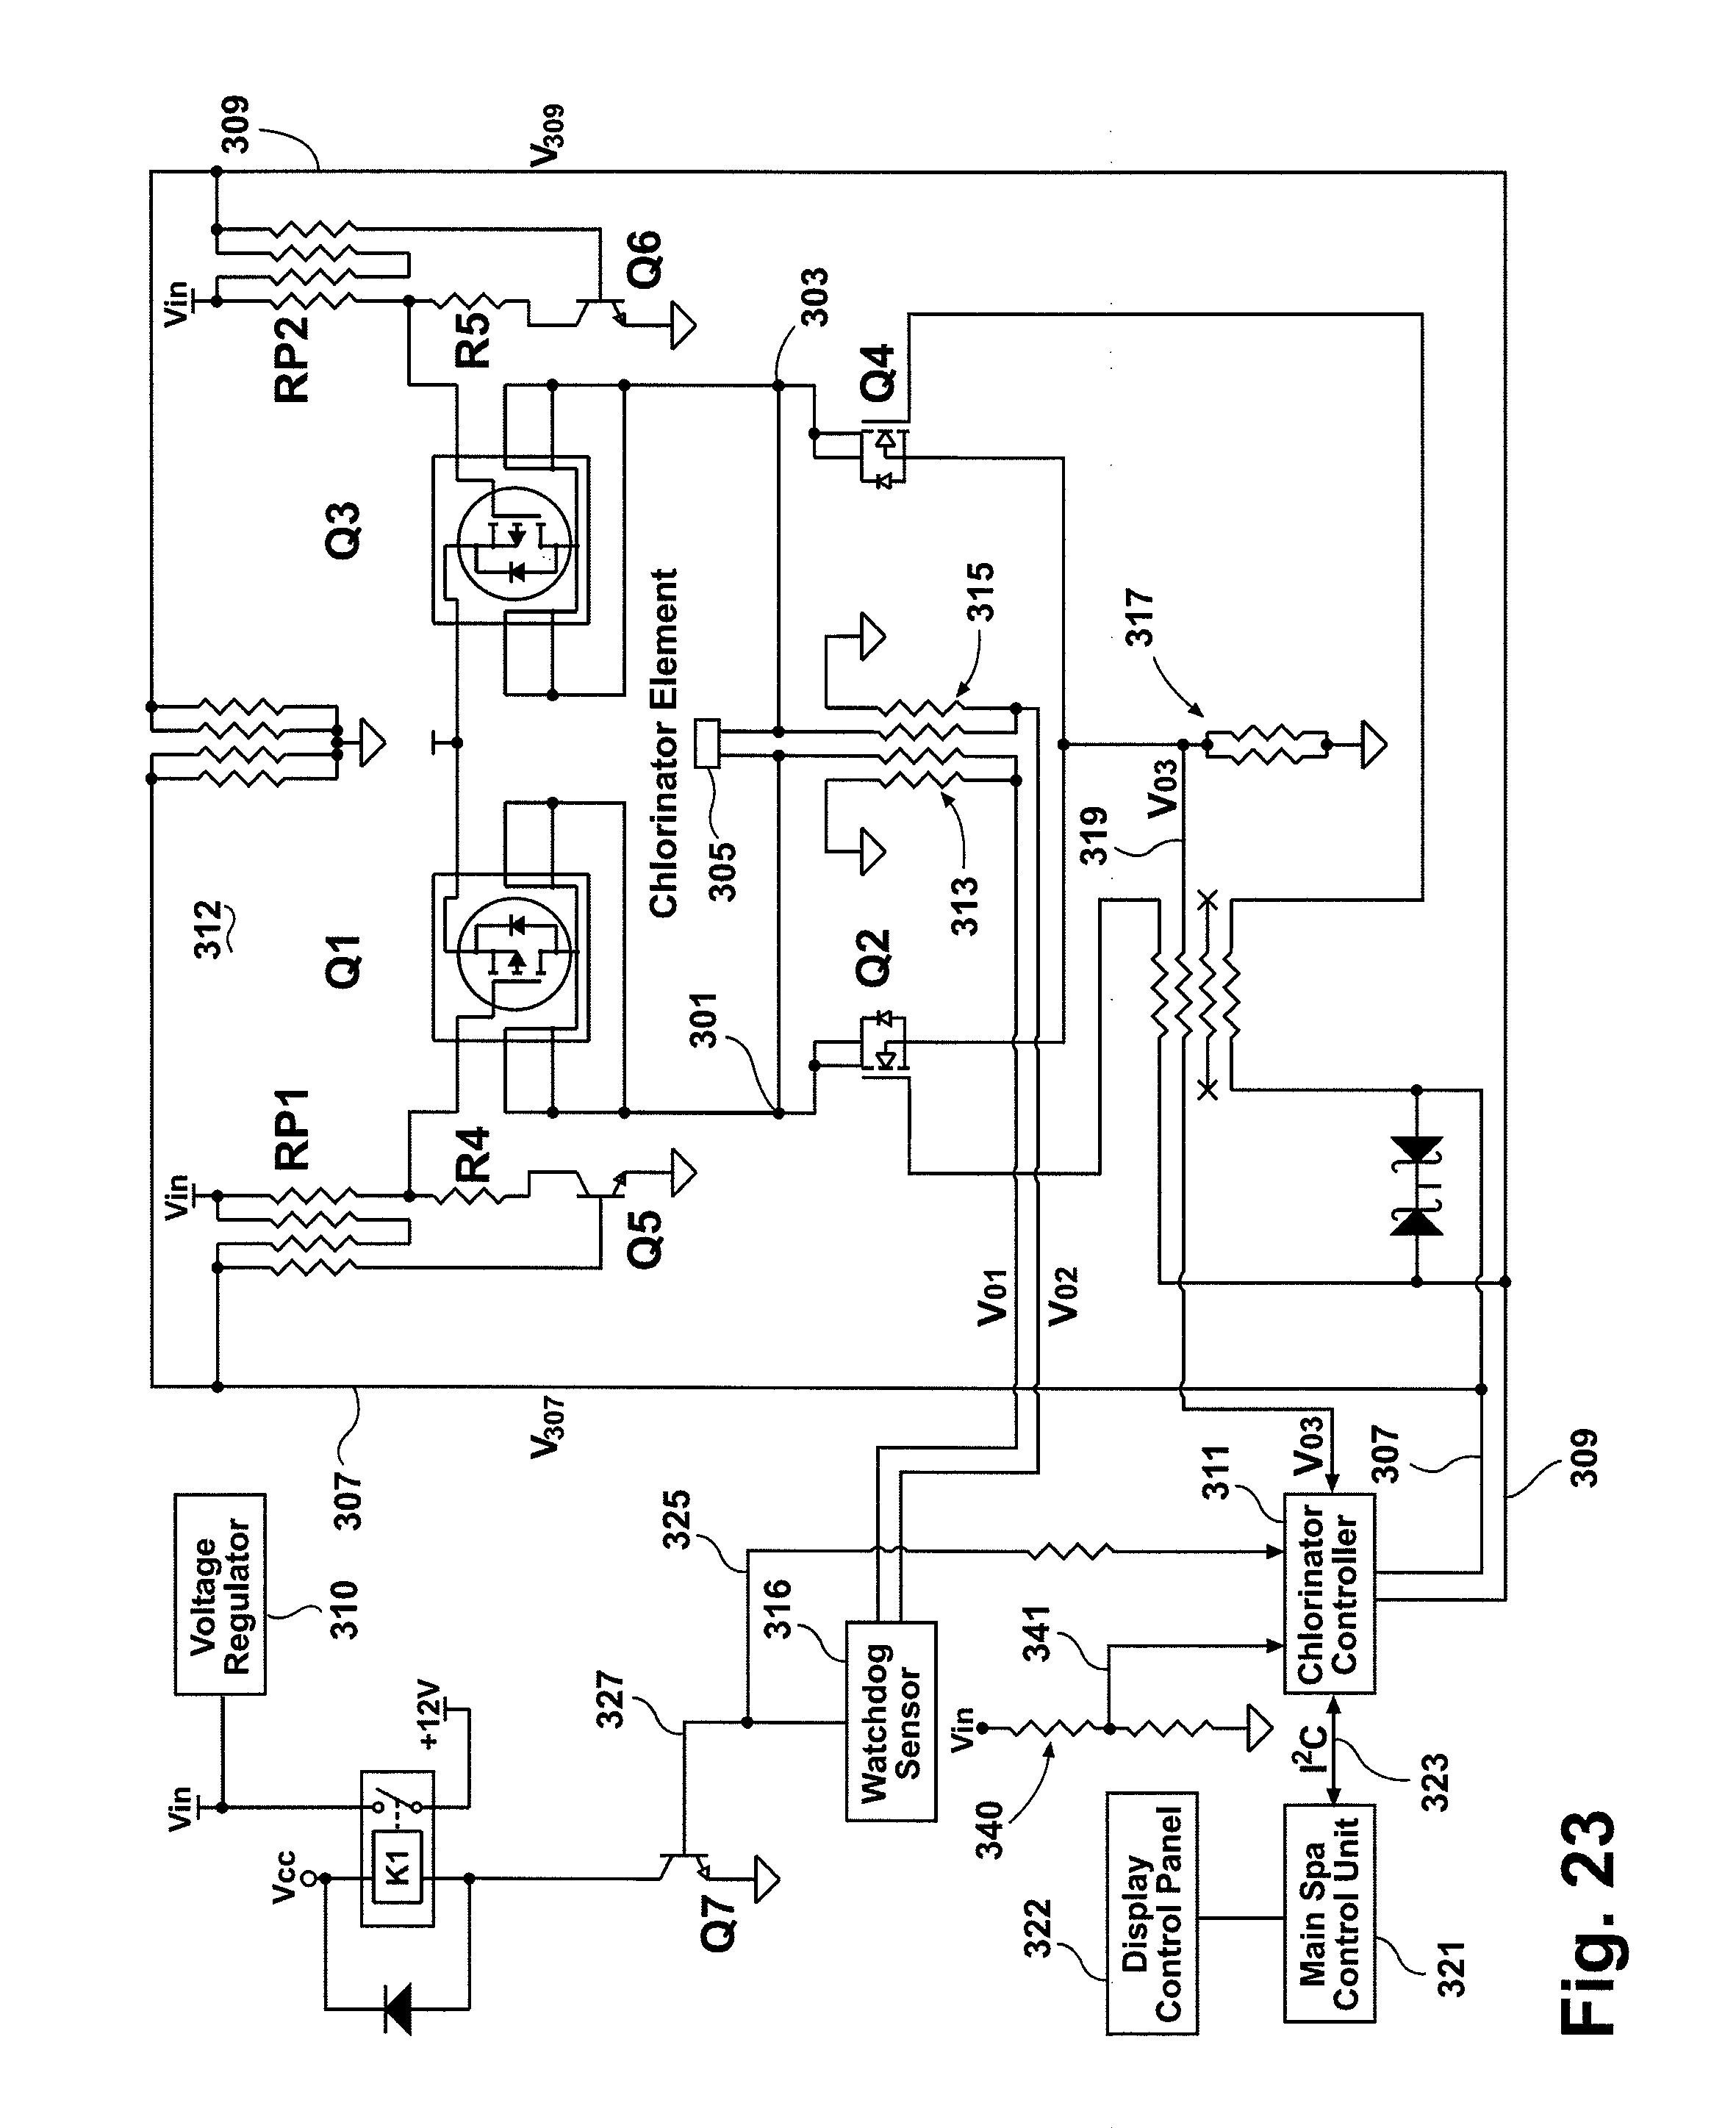 Nordic Hot Tub Wiring Diagram Hot Tub Wiring Diagram Lovely 220v Hot Tub Wiring Diagram